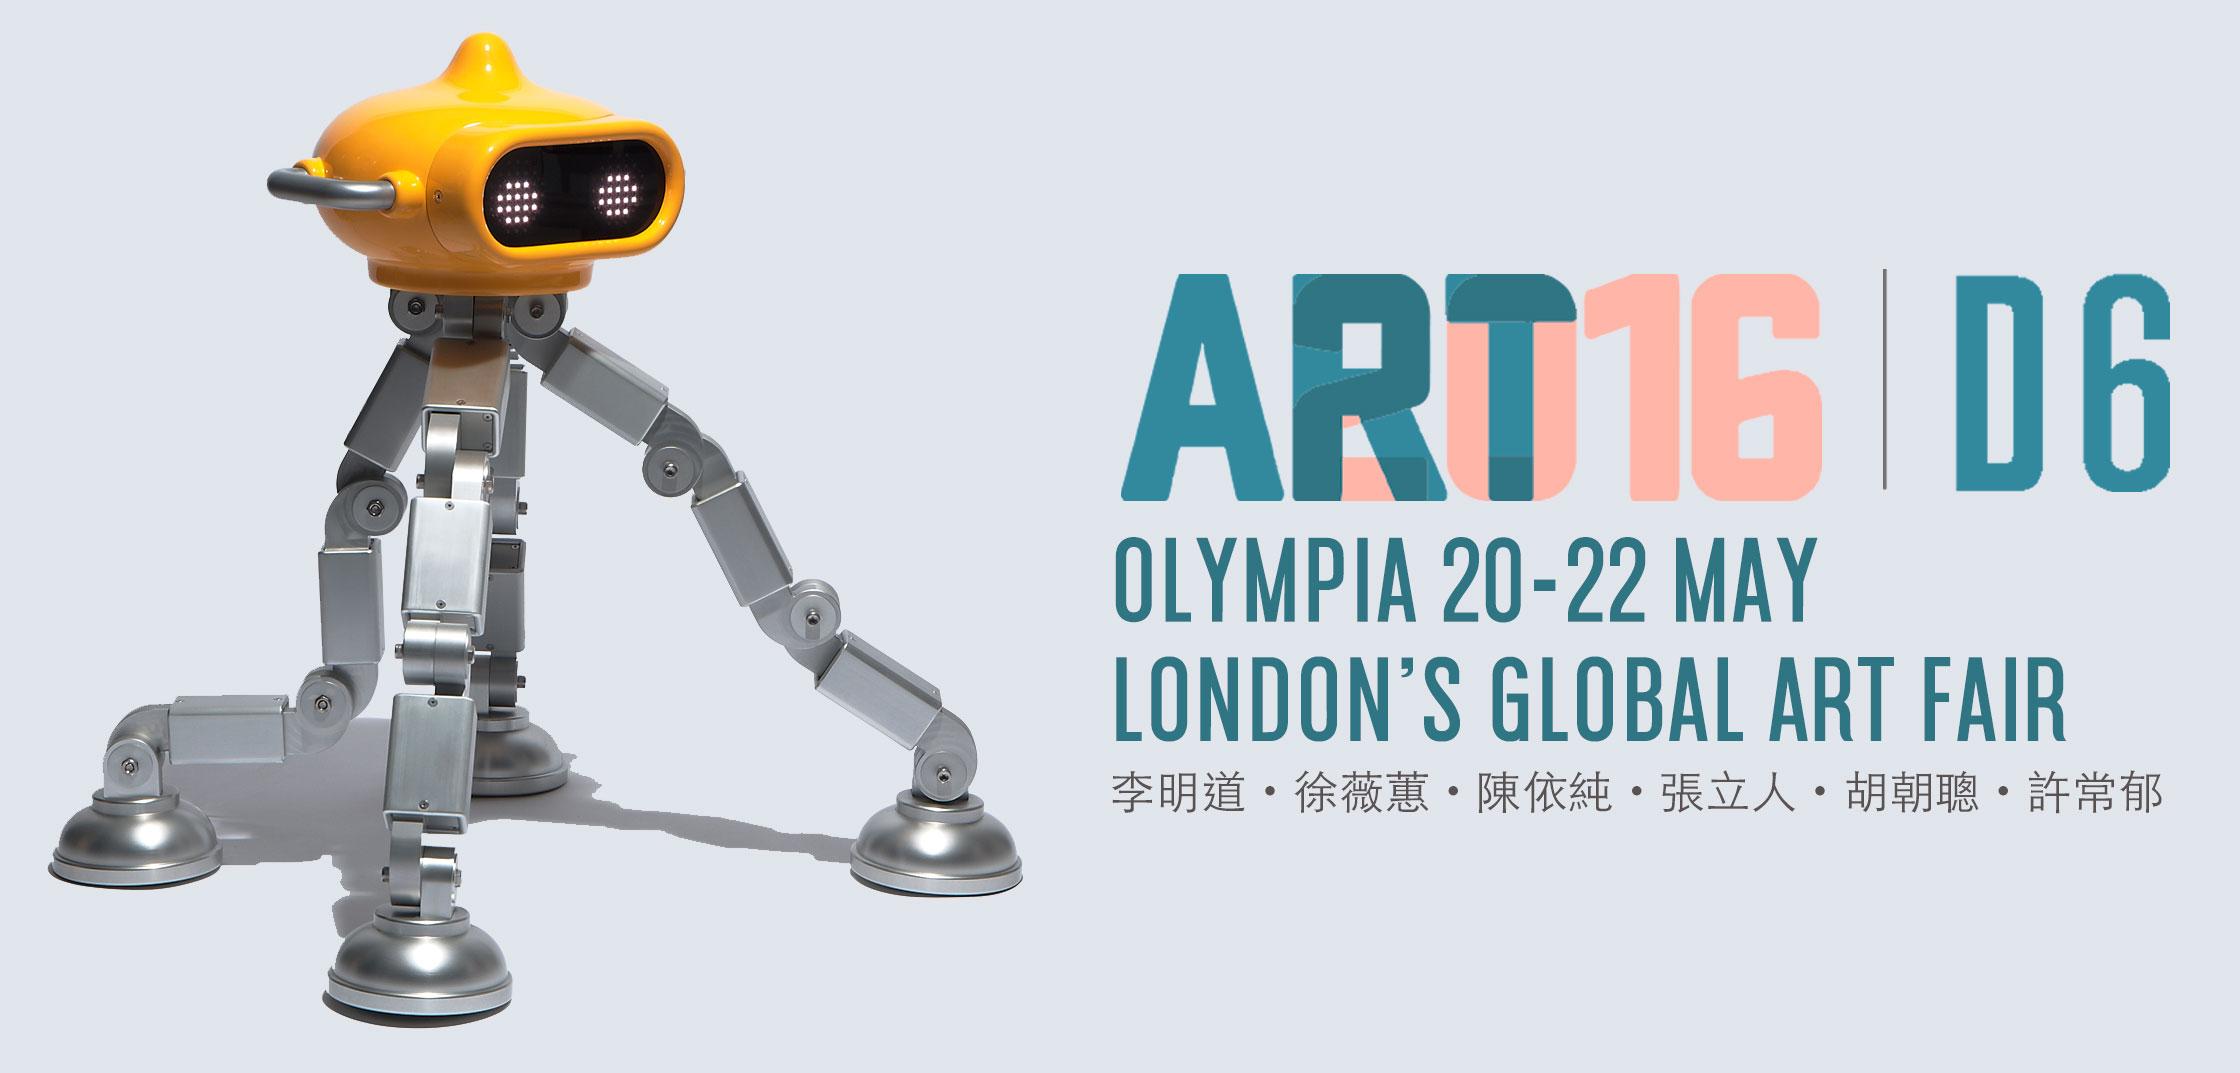 Art16 London